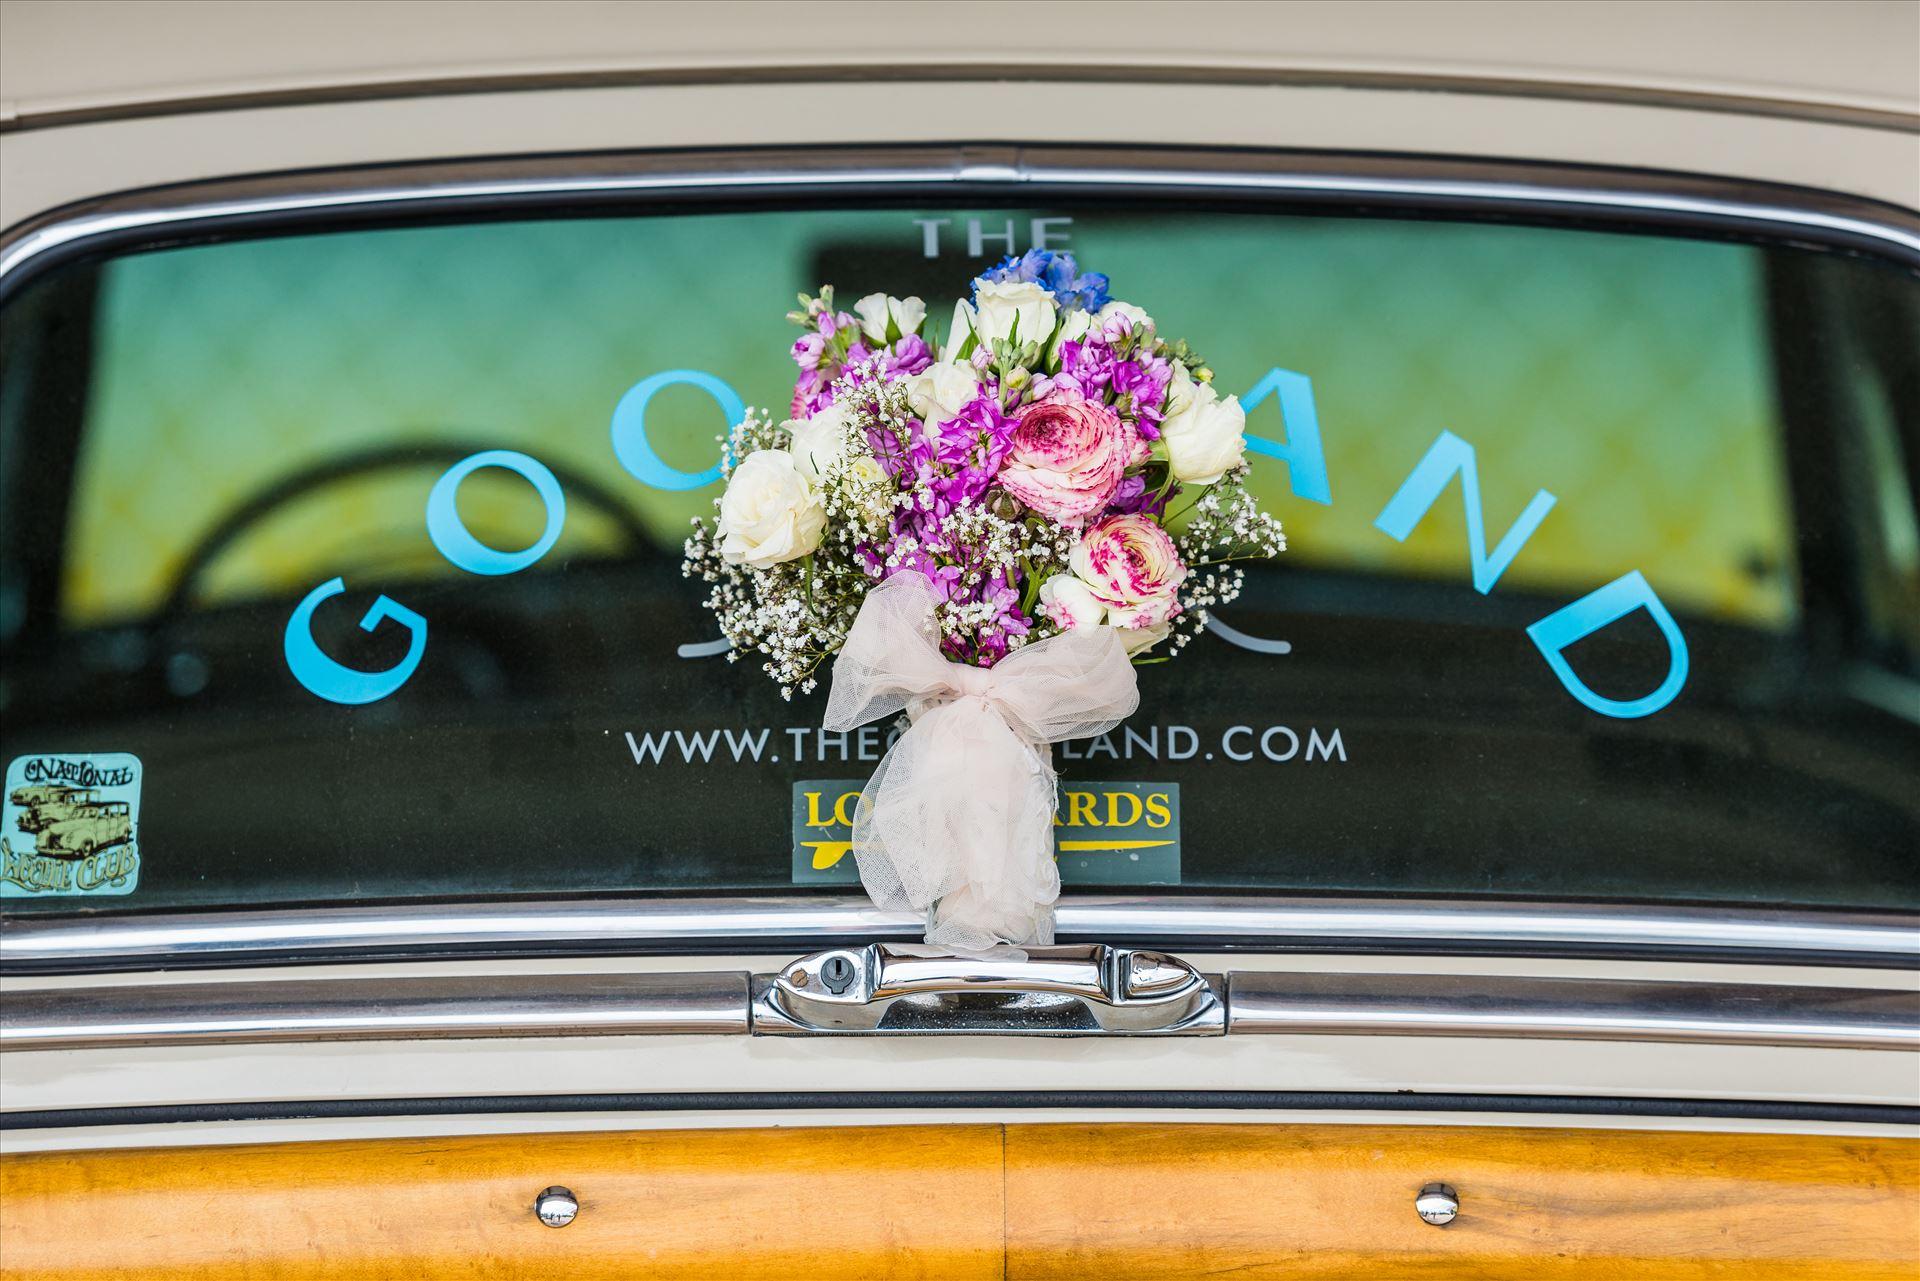 Kimpton Goodland Hotel Santa Barbara Goleta California Bride's Bouquet  by Sarah Williams